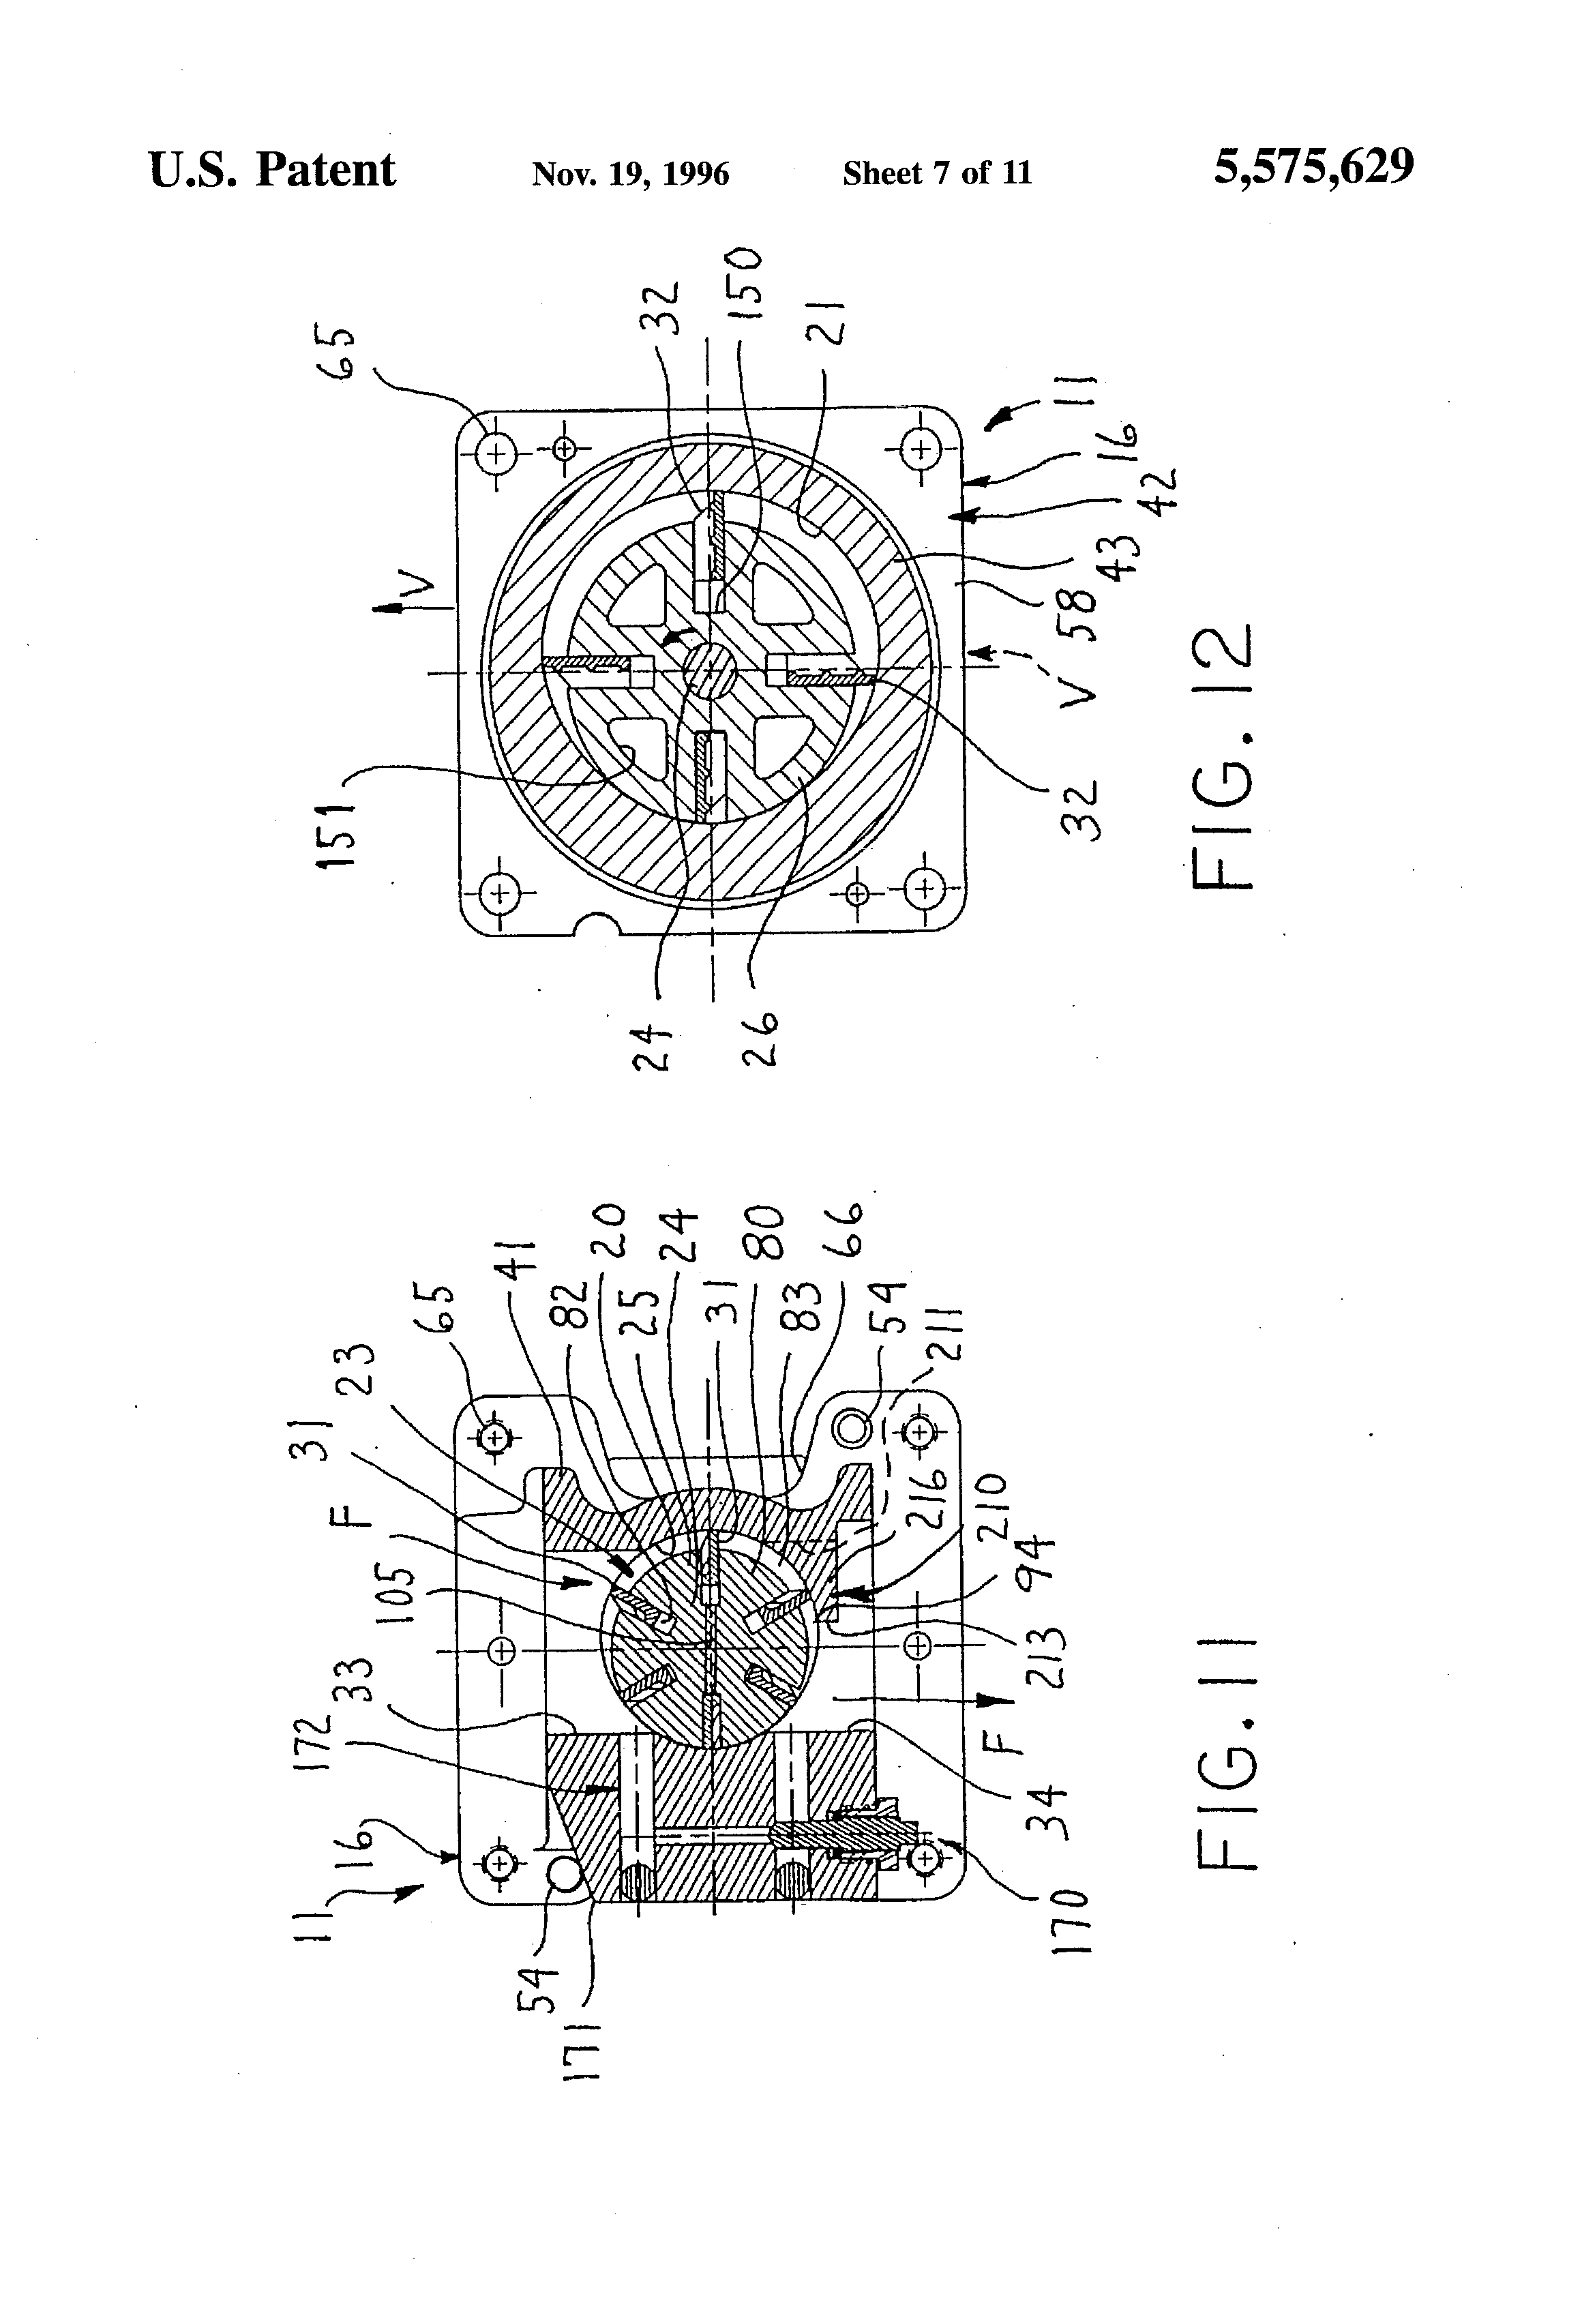 Patent Us5575629 Vapor Control System Google Patents Y210 Circuit Diagram Drawing